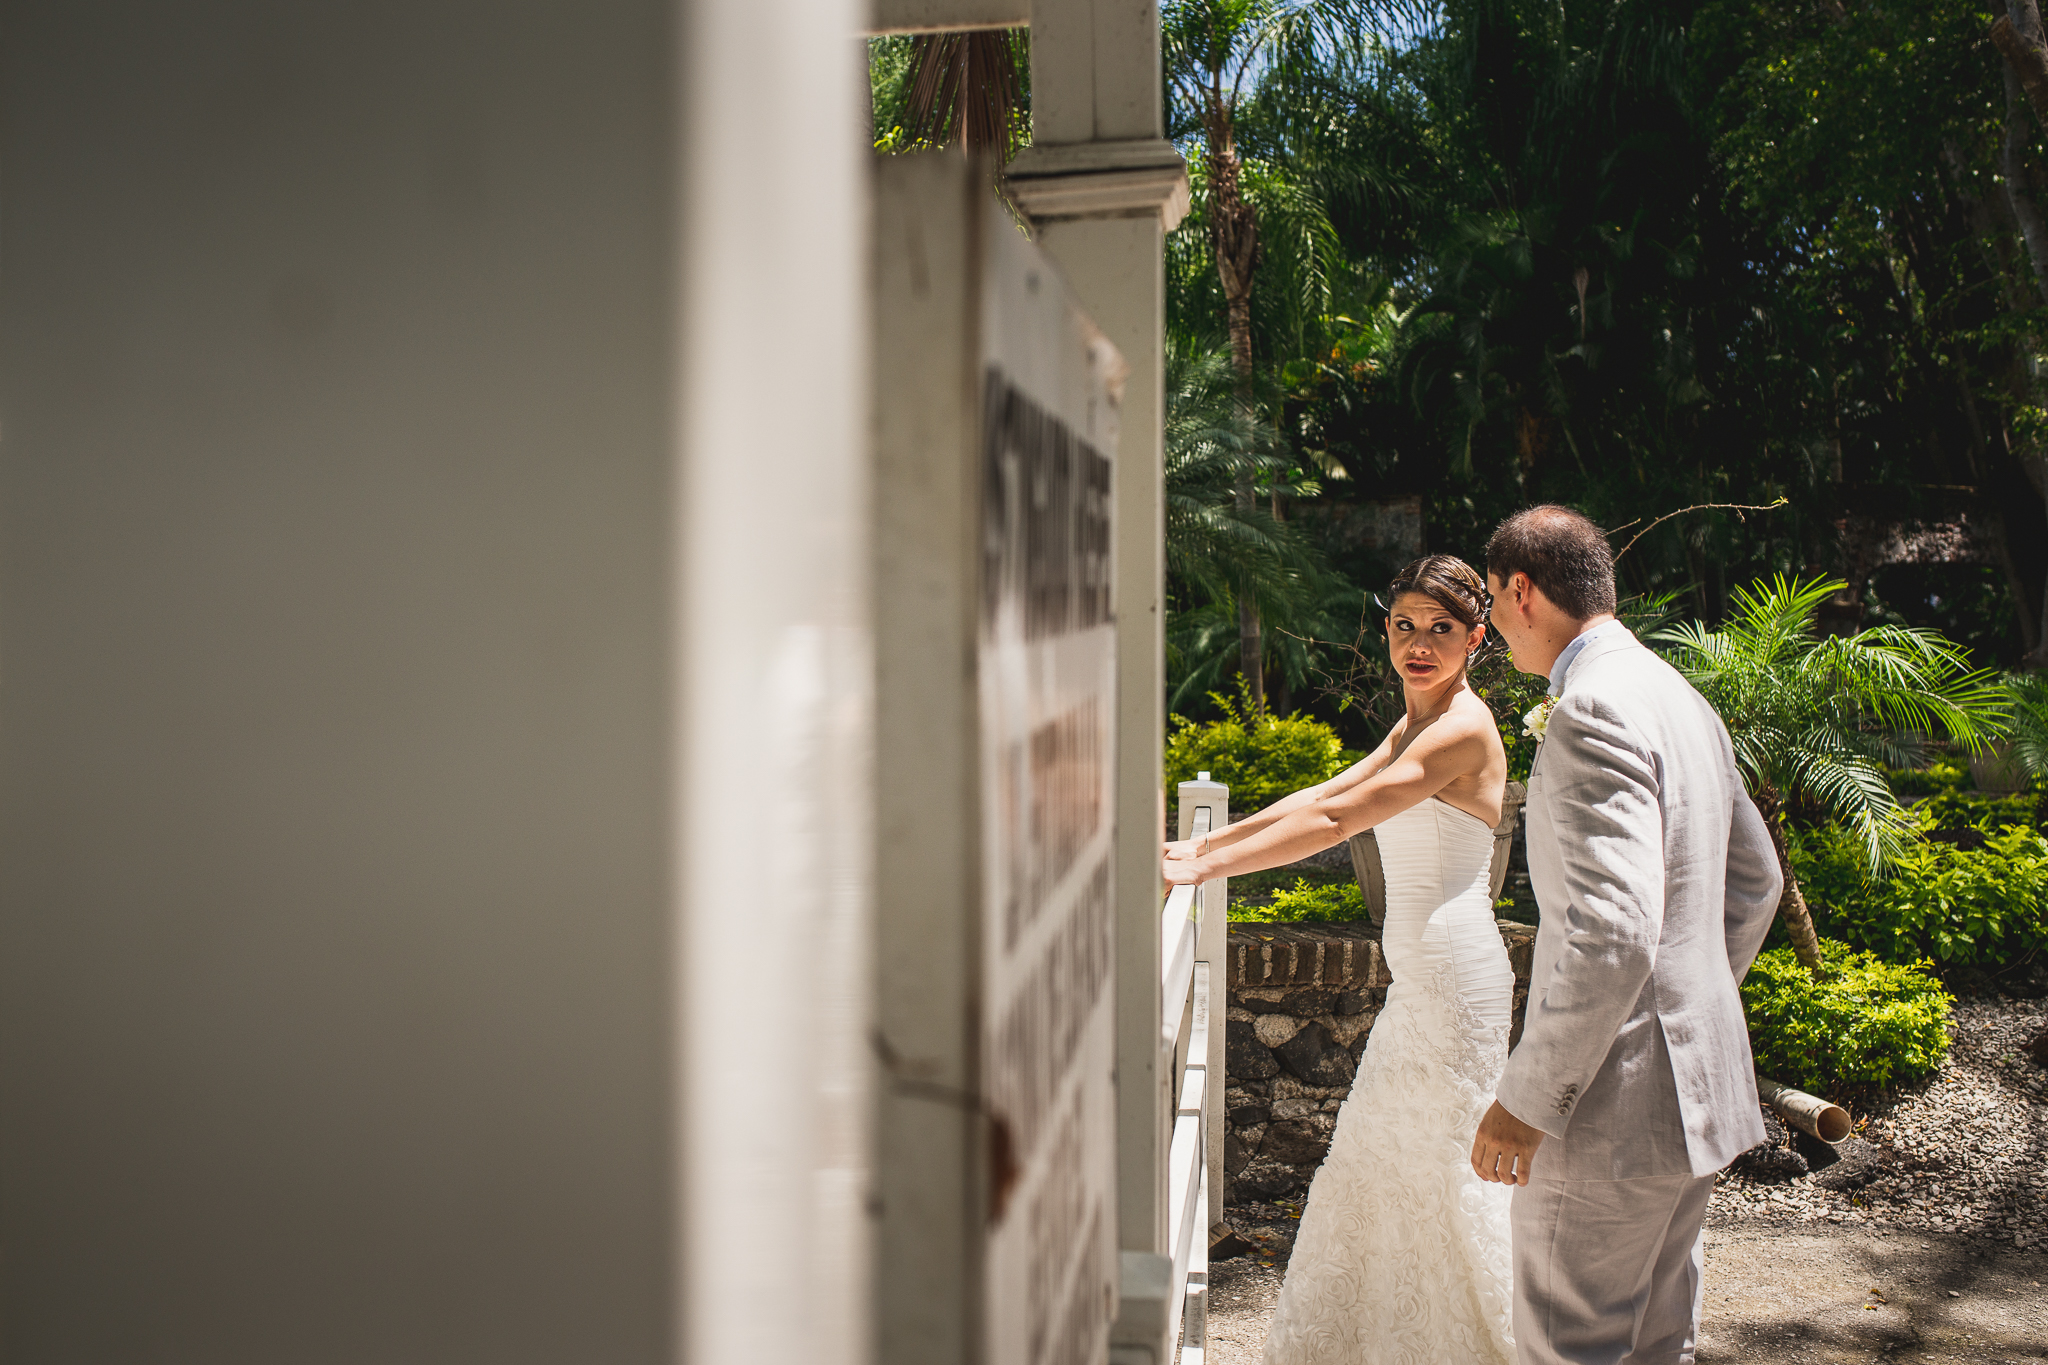 wedding-photography-mexico-quinta-rubelinas-25.jpg